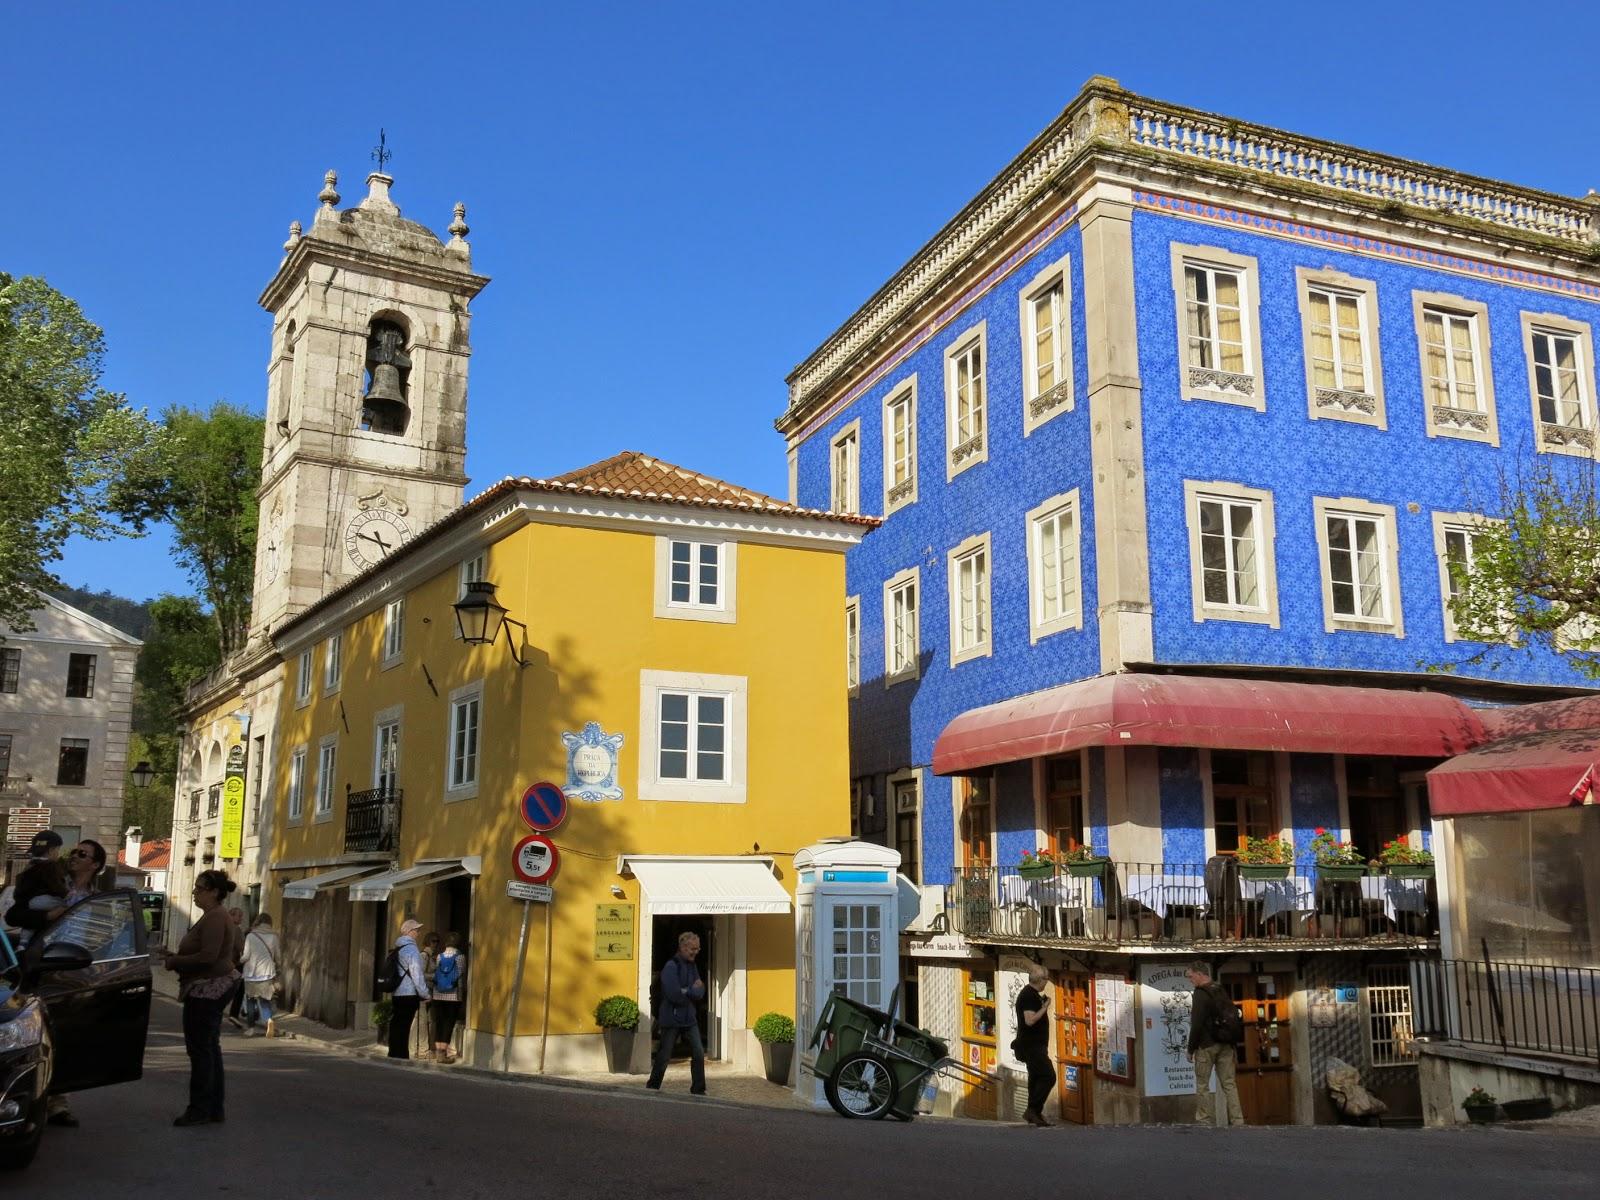 Sintra - Centro historico